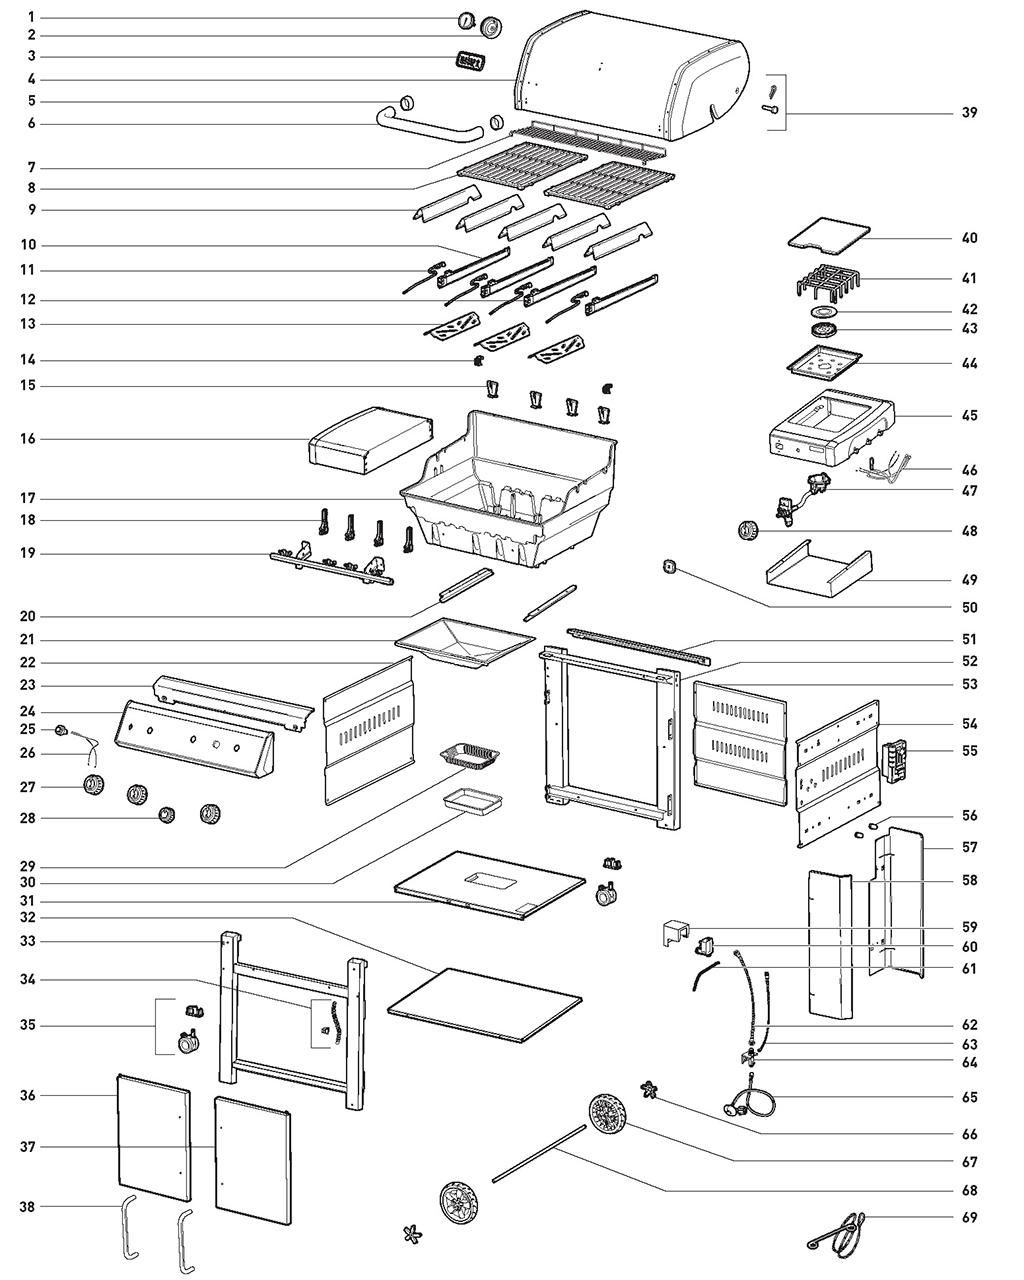 Schematic Image 61016001